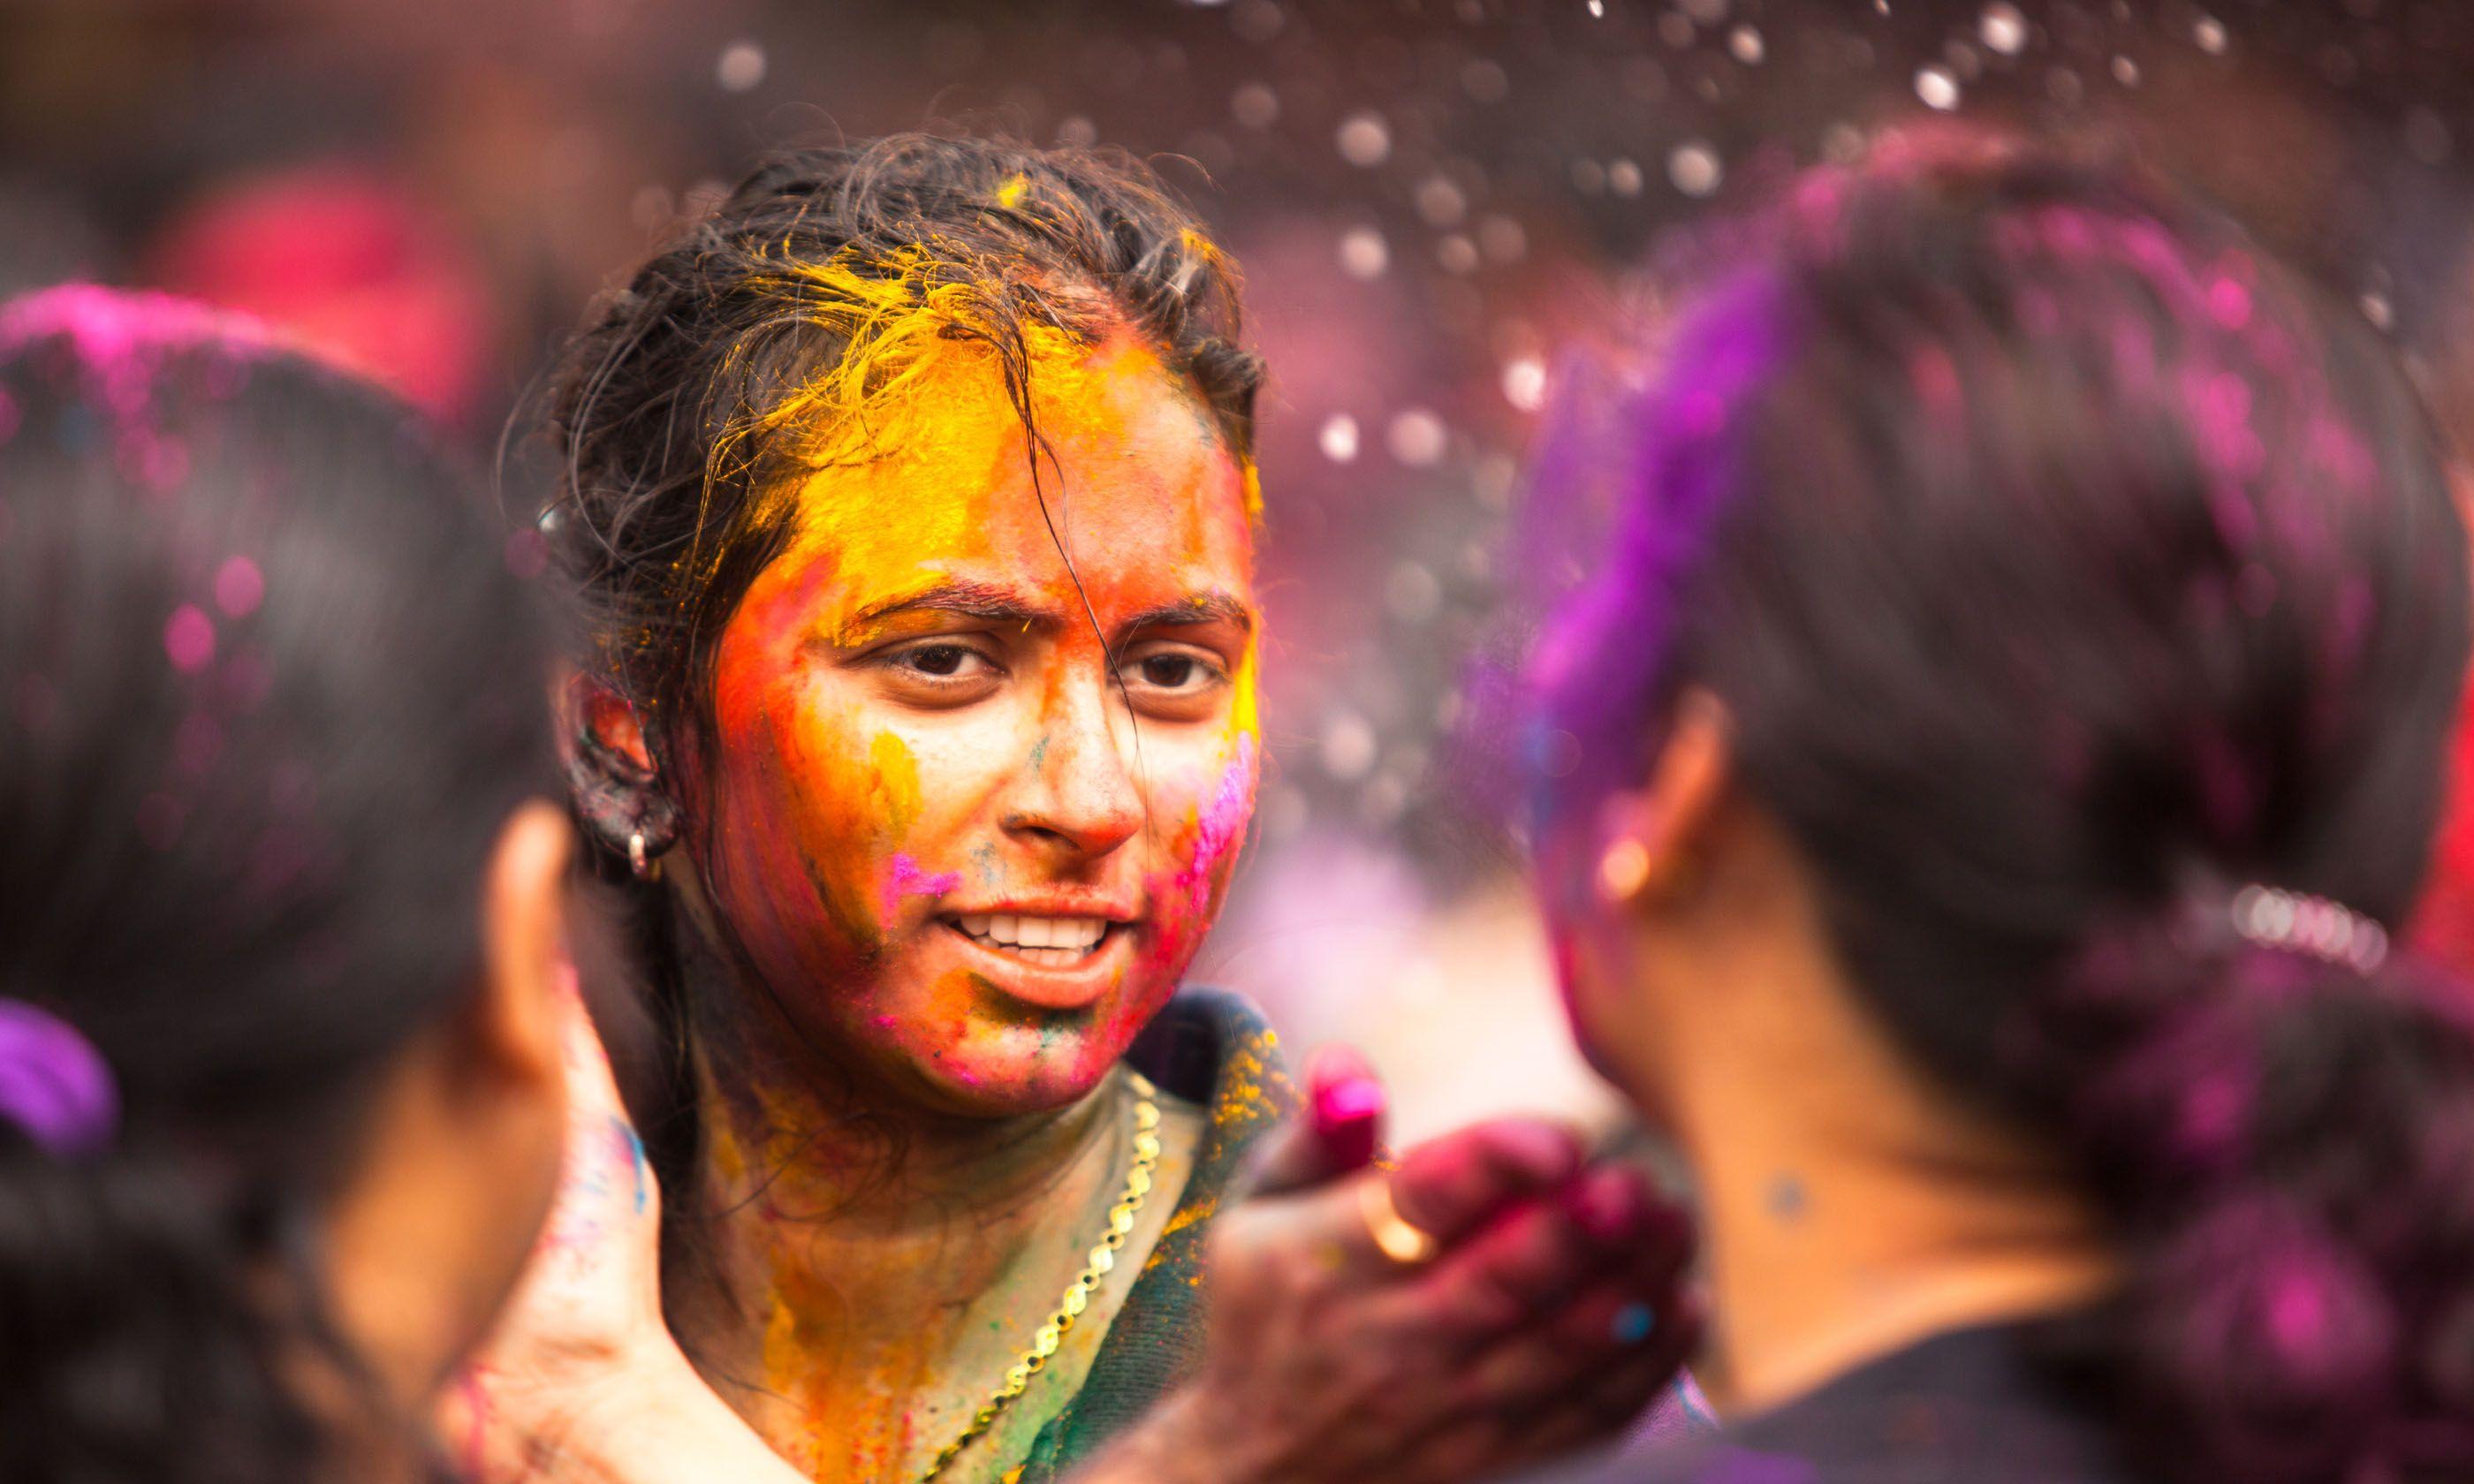 Celebrating Holi in Kuala Lumpur (Shutterstock.com)